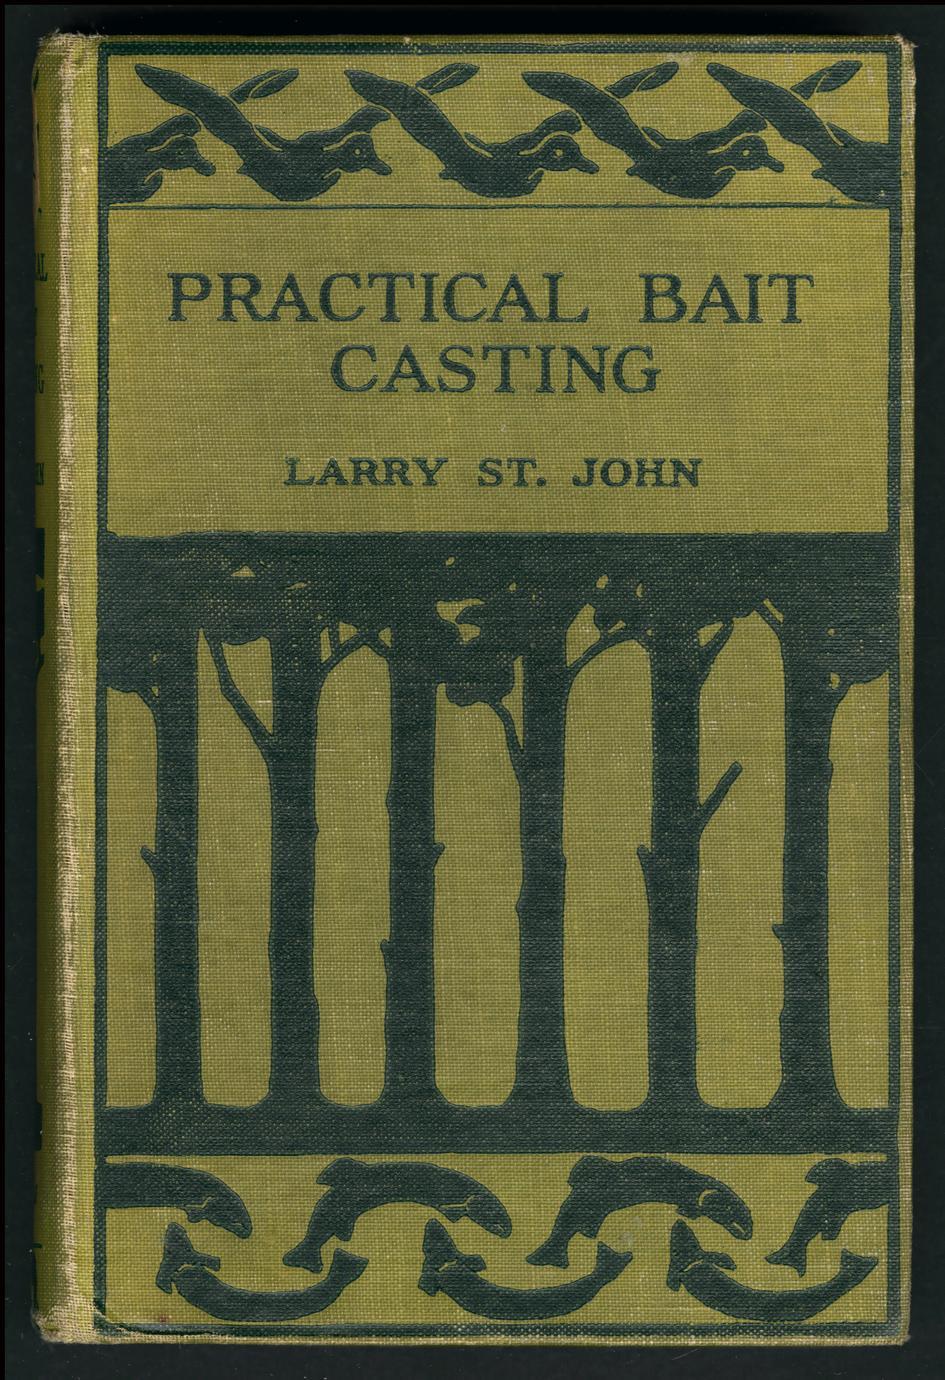 Practical bait casting (1 of 2)